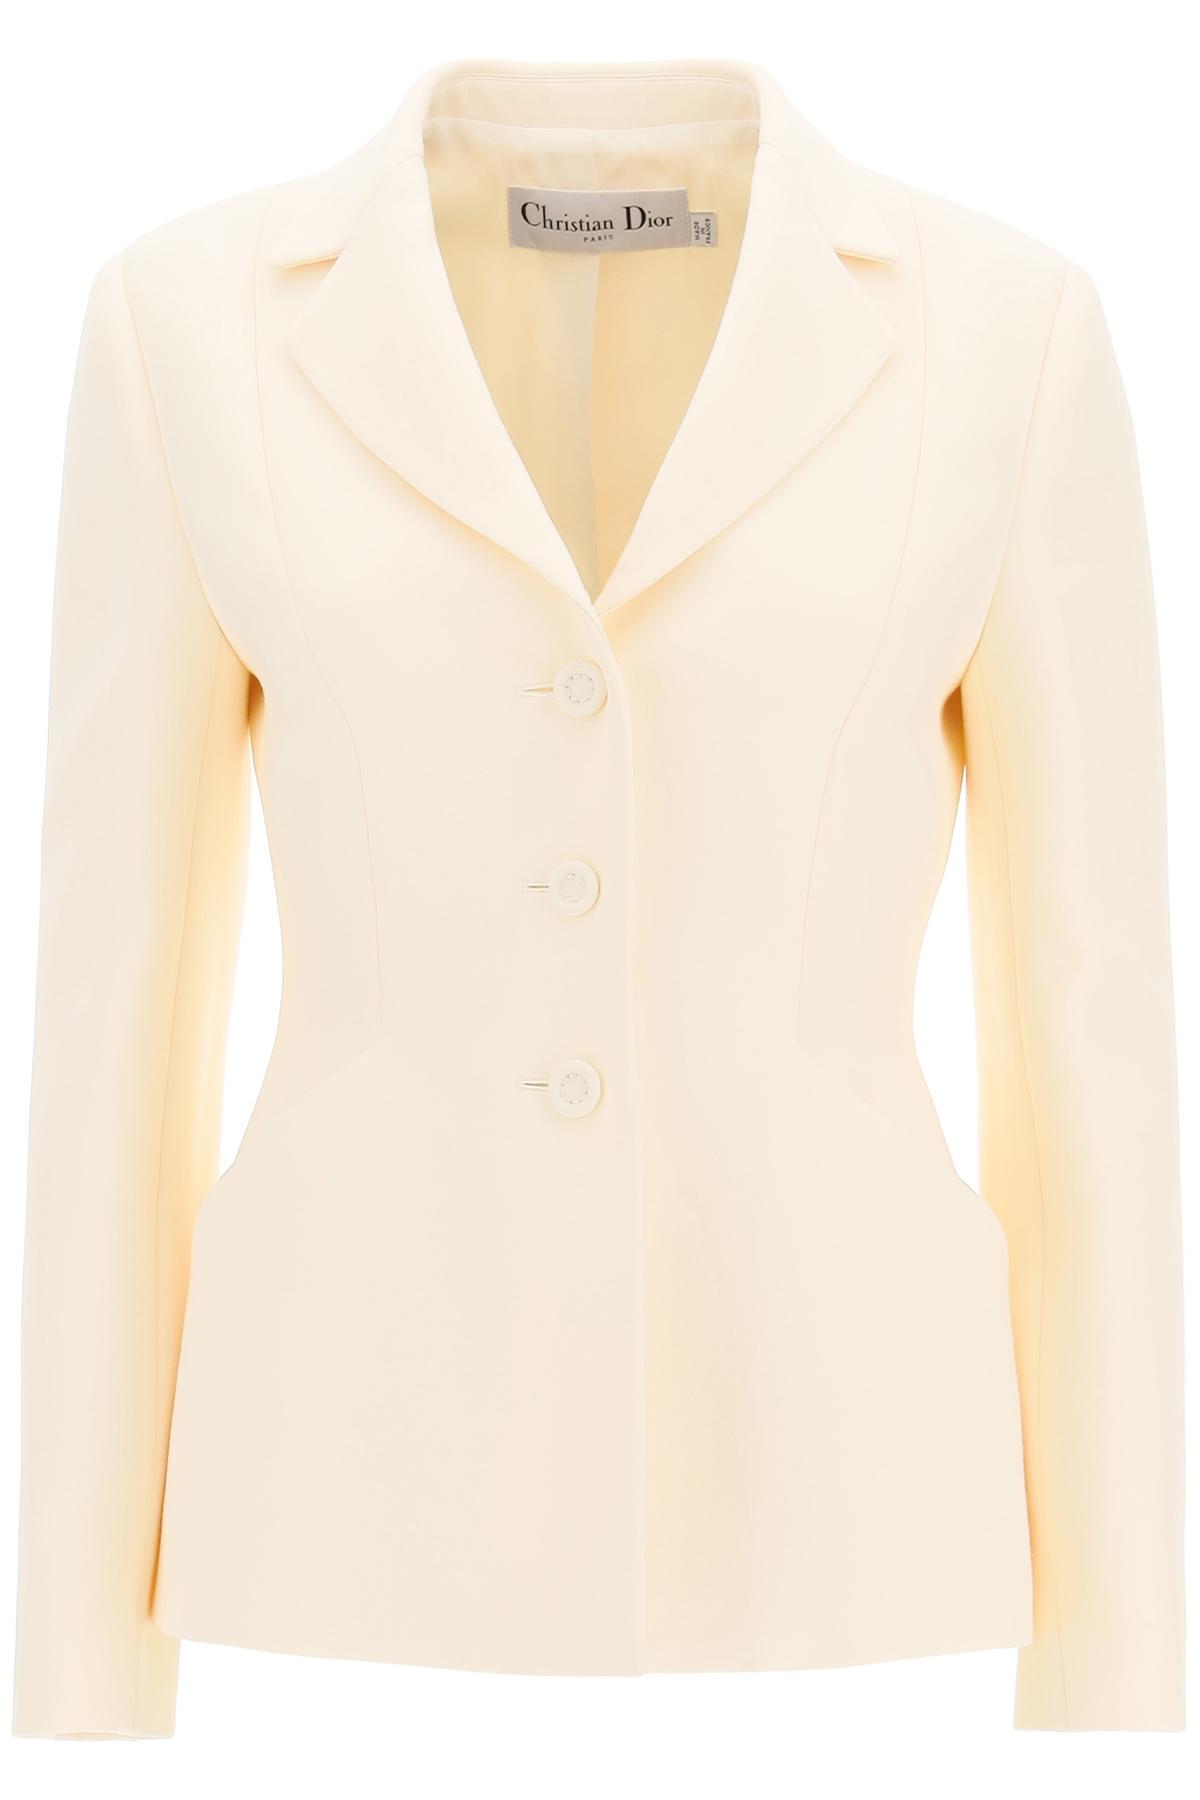 Dior giacca bar 30 montaigne